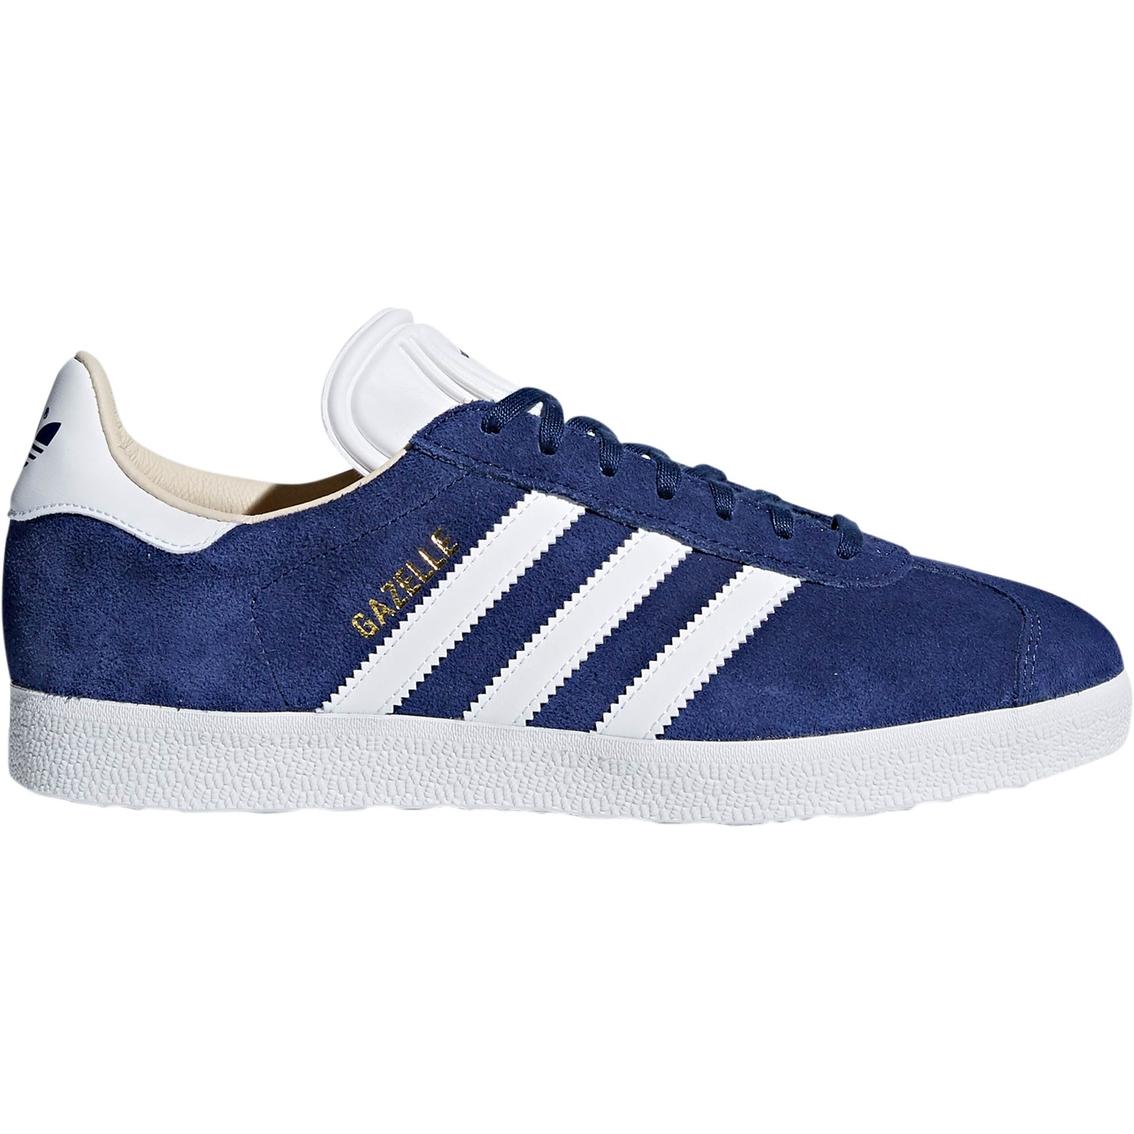 ... spain adidas womens gazelle athletic shoes 8a941 f9557 82ad88935